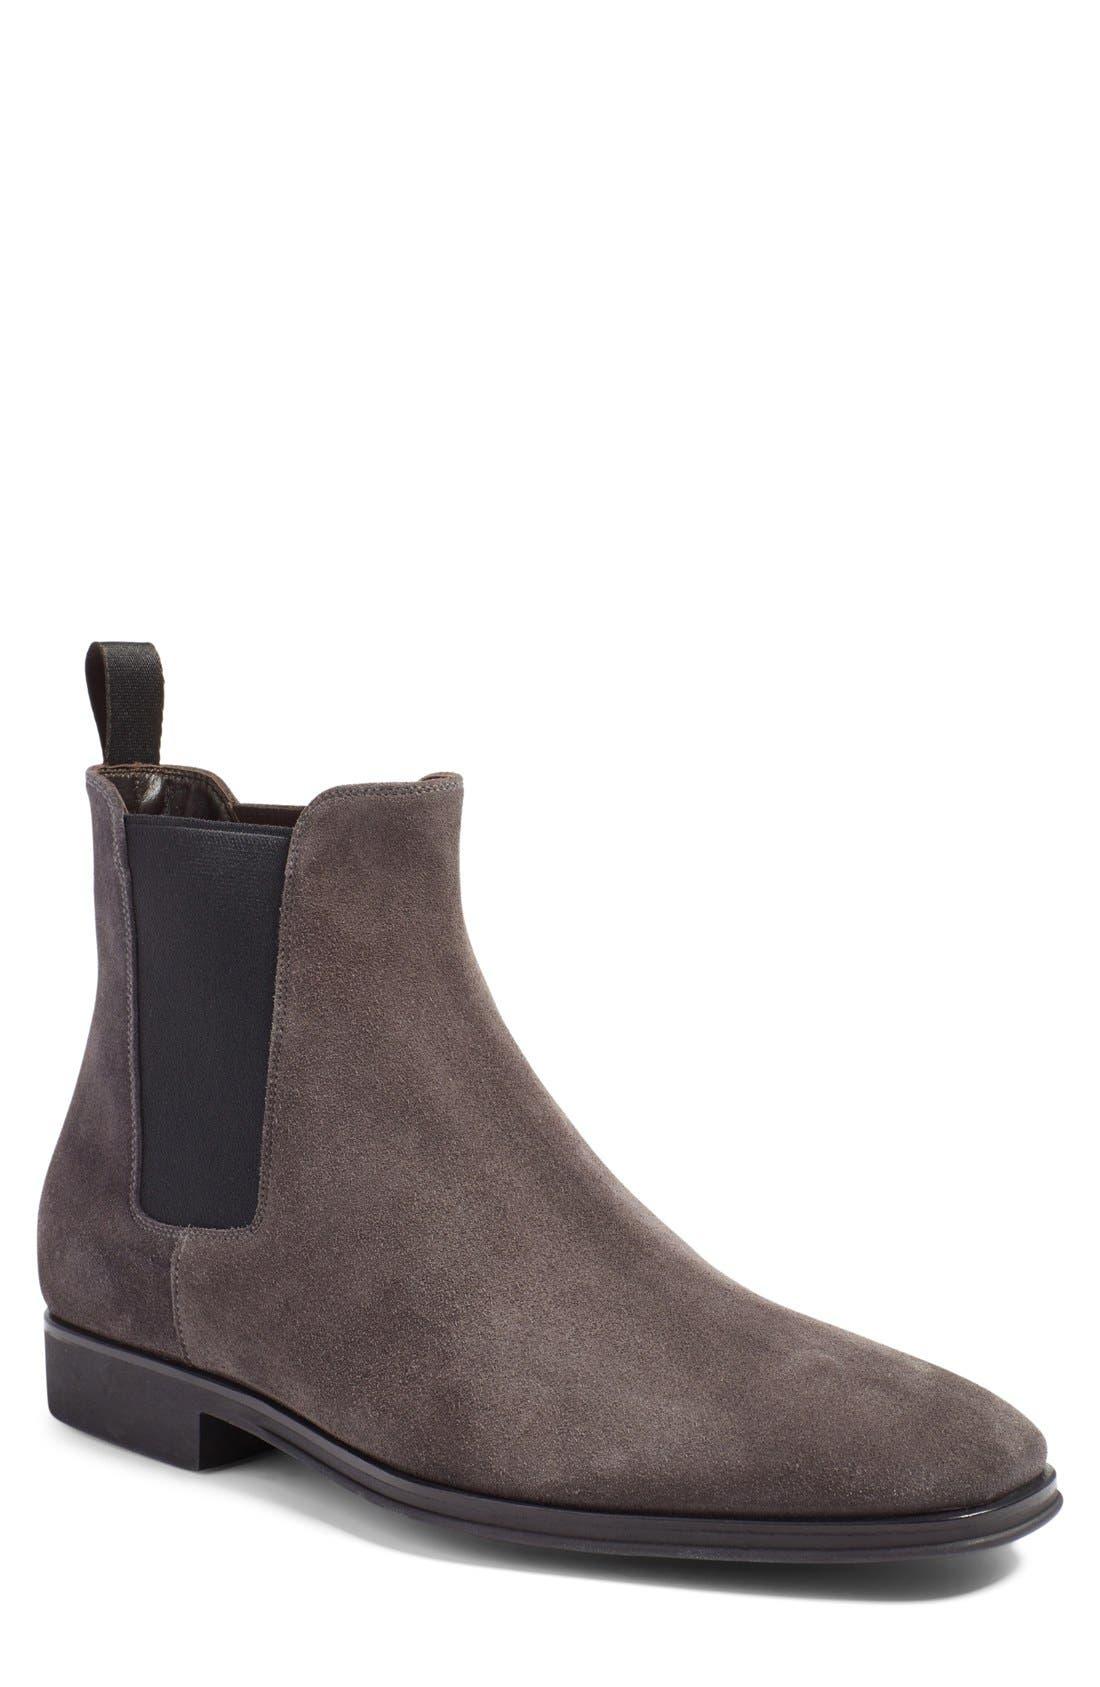 Monte Rosso Enrico Chelsea Boot (Men) (Nordstrom Exclusive)